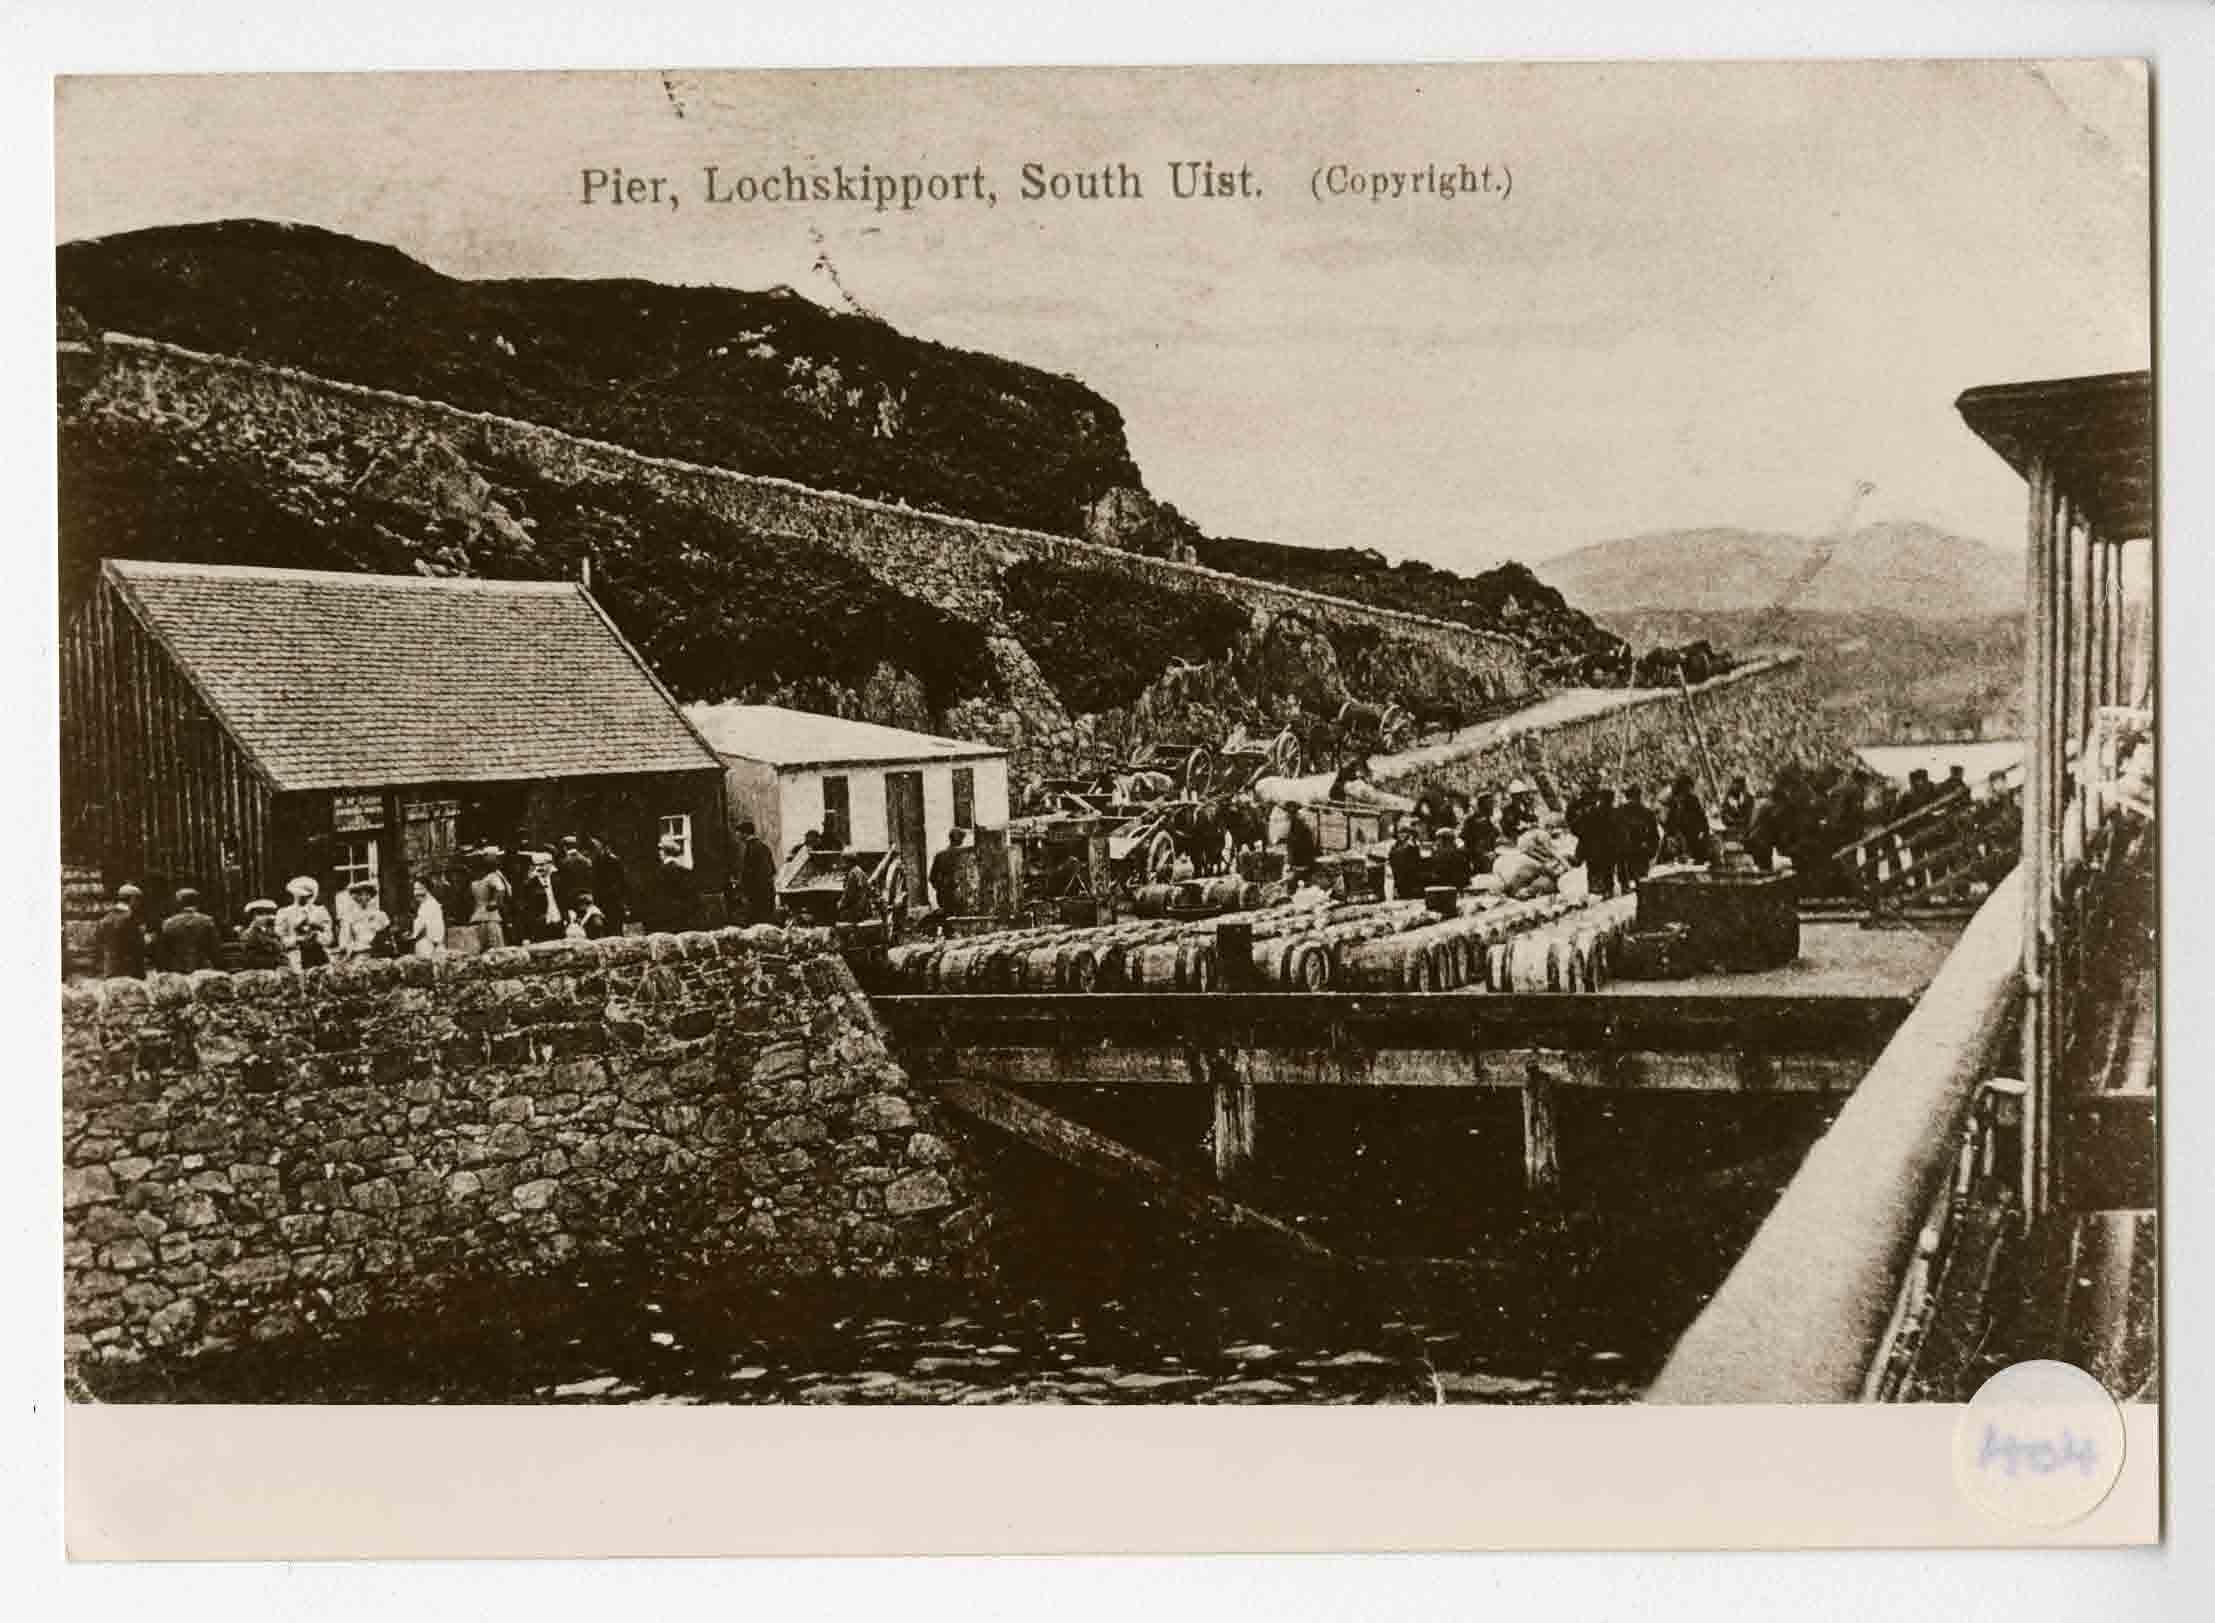 The pier at Loch Skipport